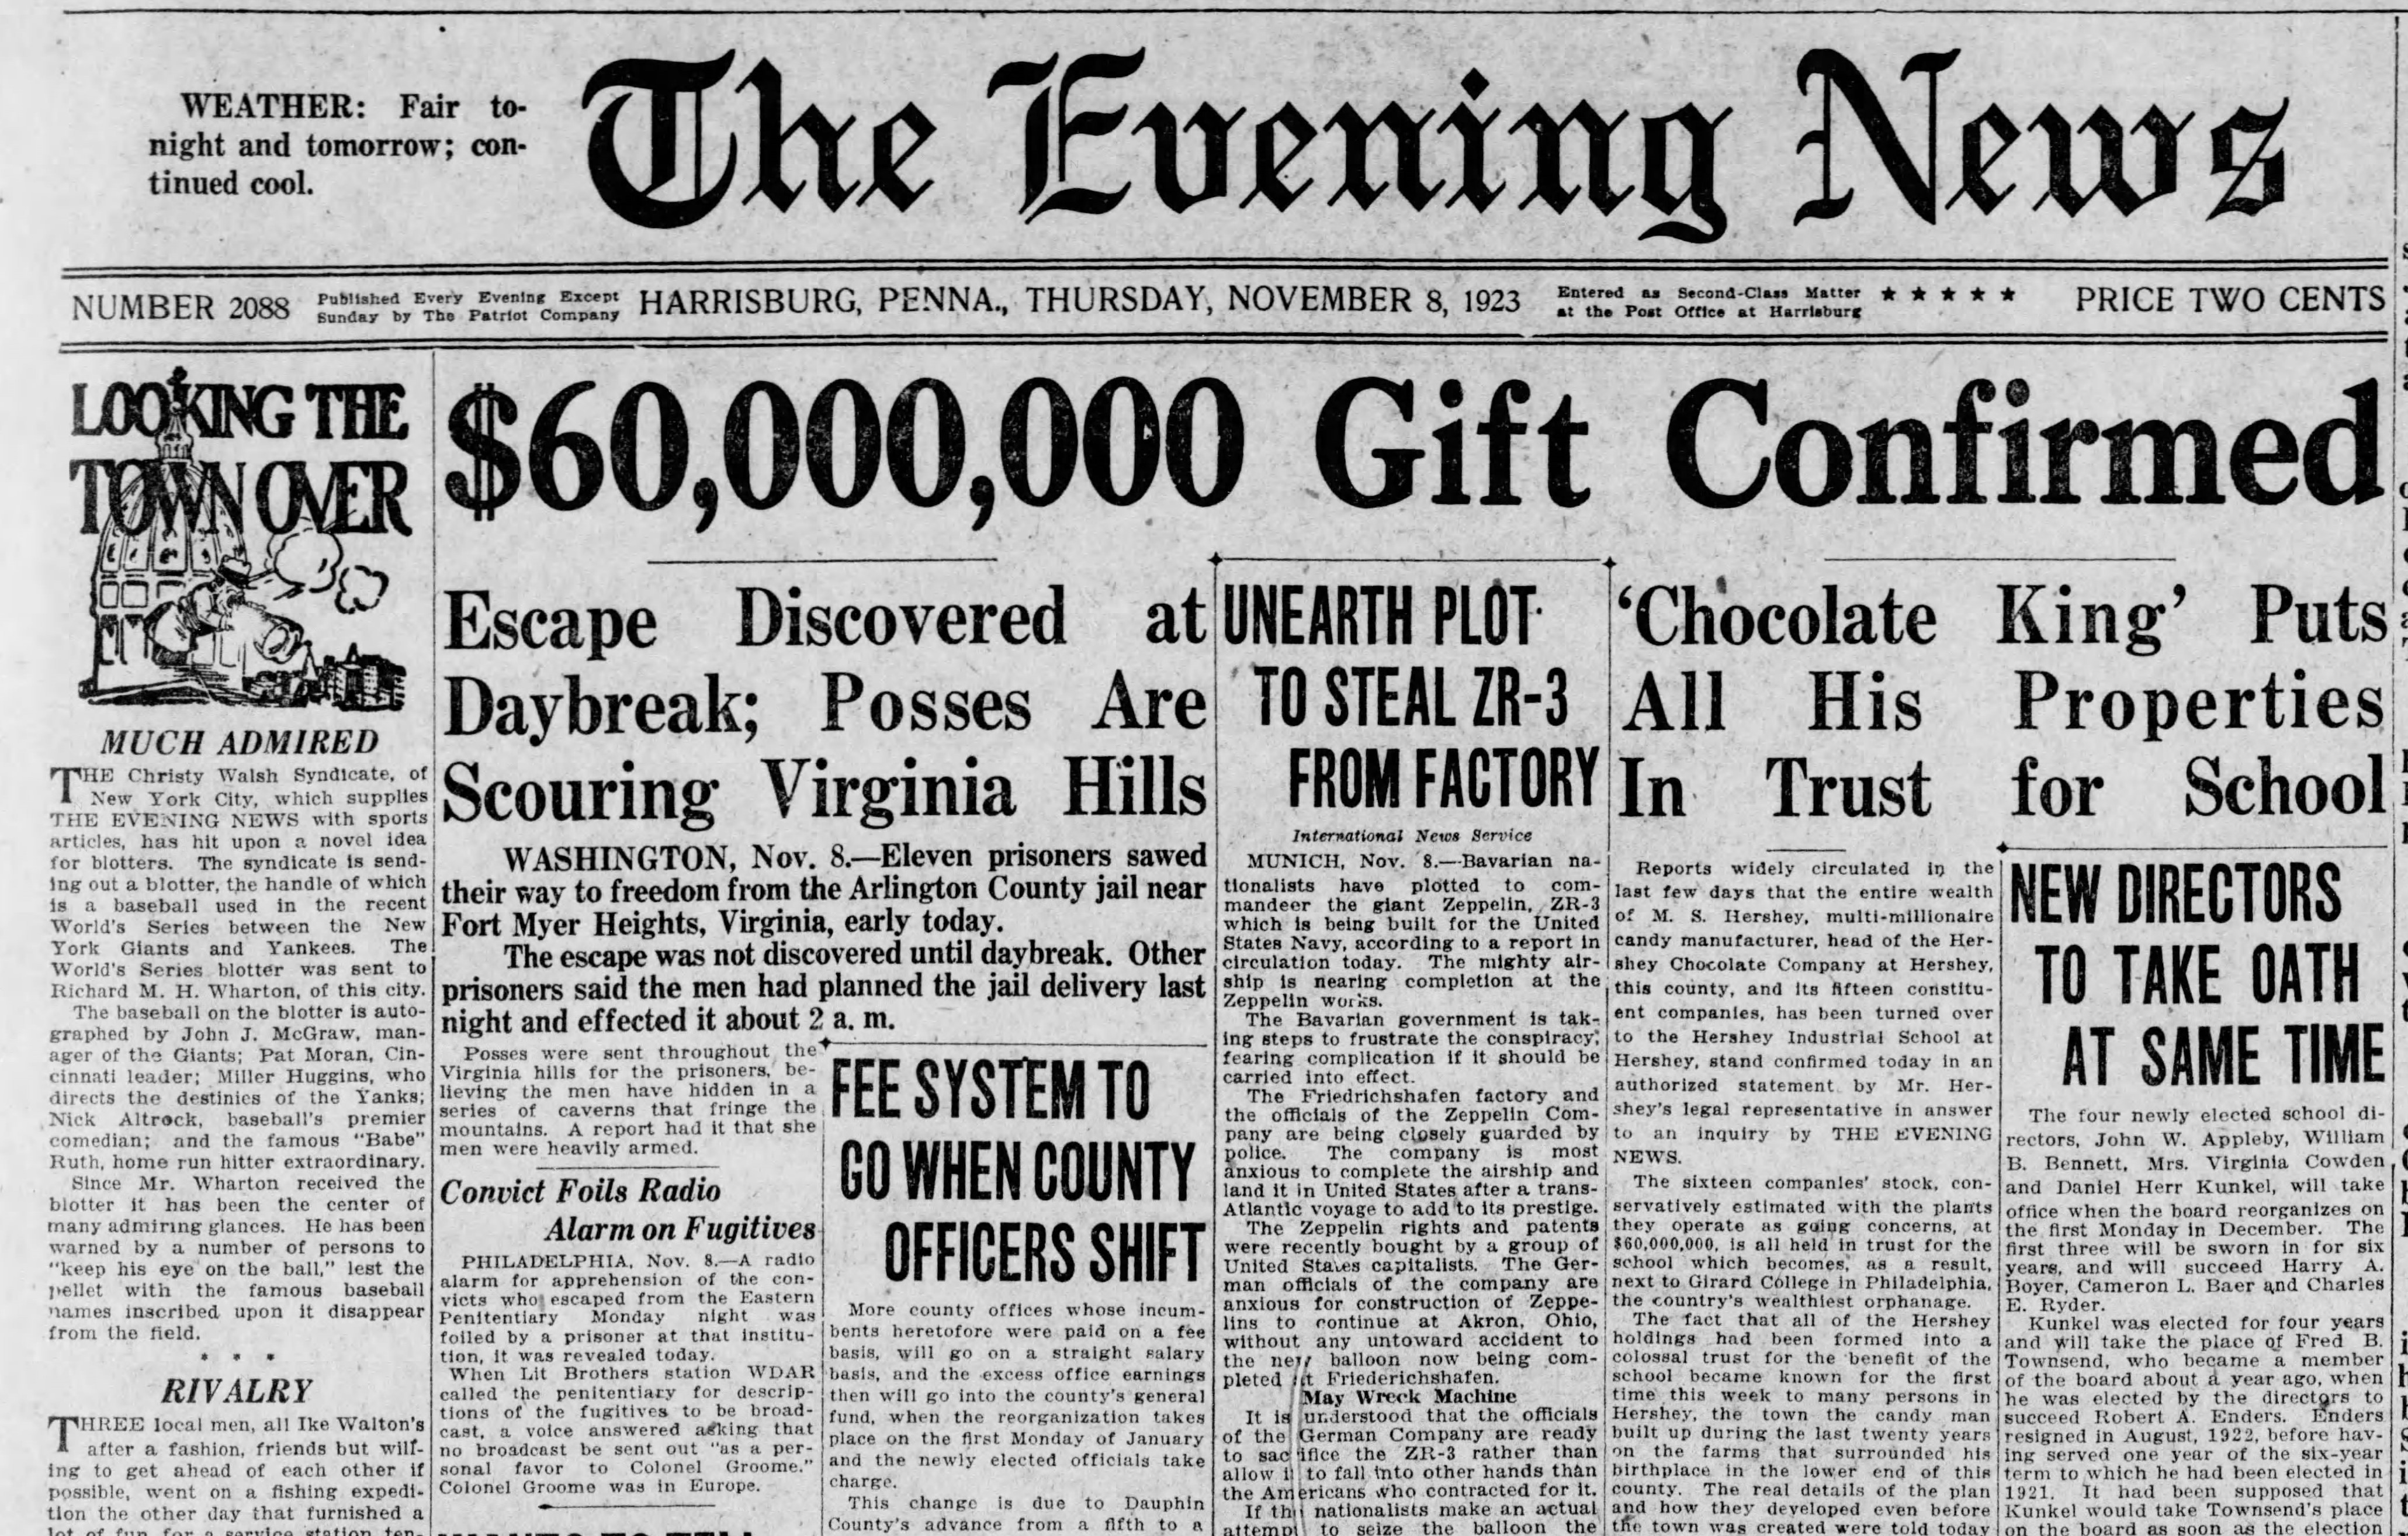 Harrisburg Evening News article sharing Milton Hershey's gift